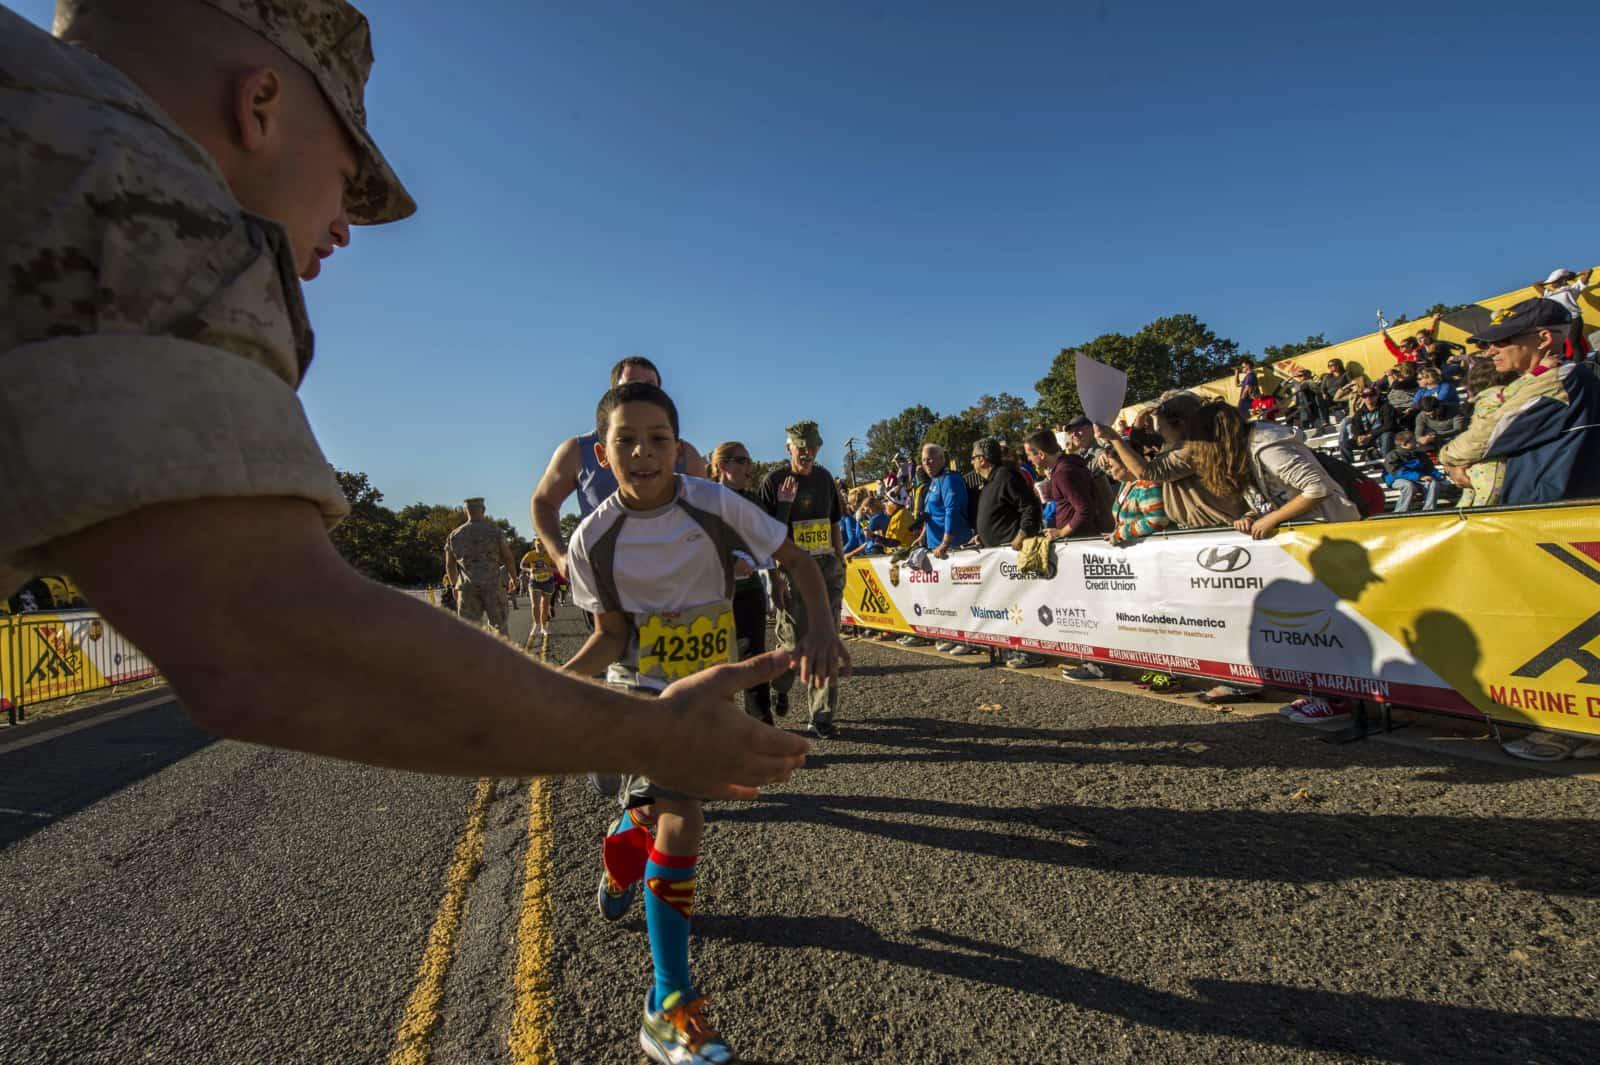 Become a Sponsor - Sponsors - Marine Corps Marathon